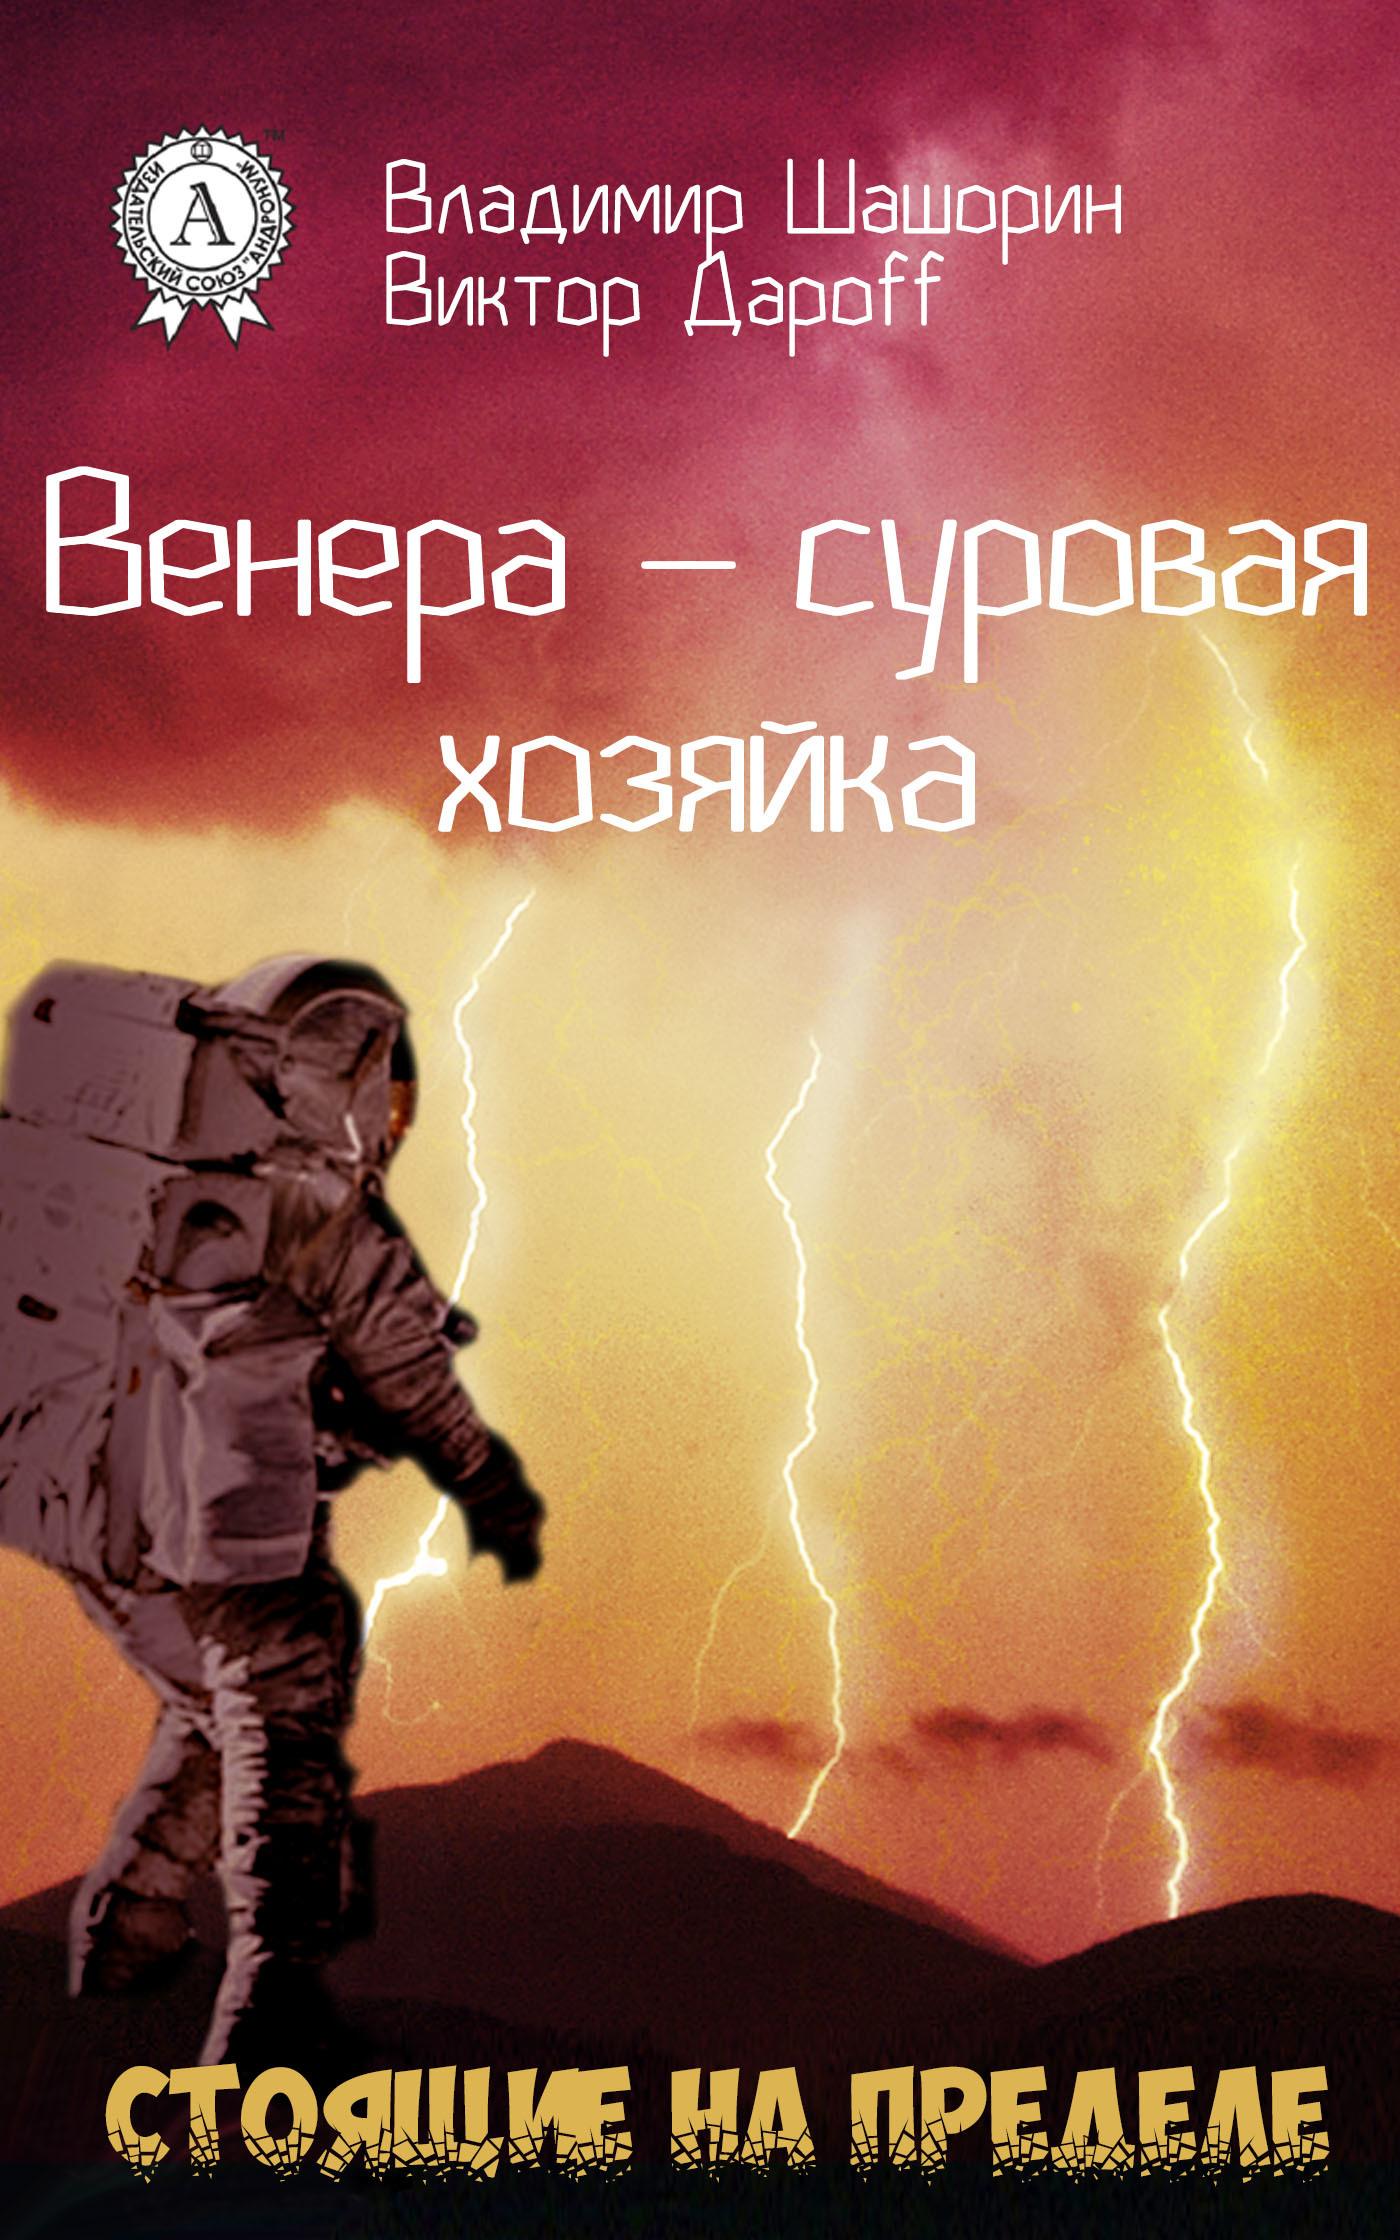 Владимир Шашорин, Виктор Дароff - Венера – суровая хозяйка